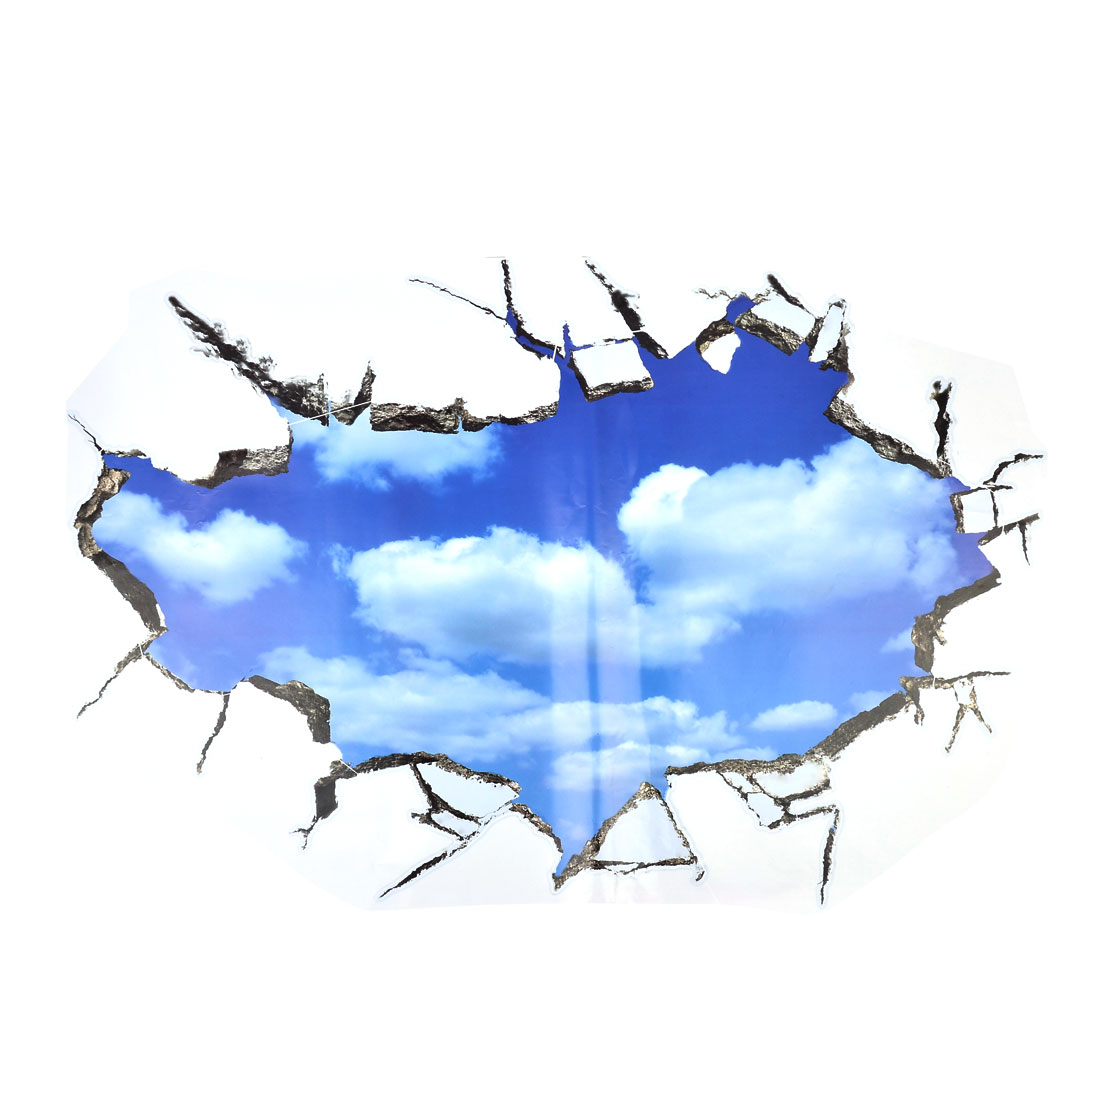 Self adhesive Graphic Art Mural Pj Masks kids bedroom 5 3D Window View Decal Graphic WALL STICKER Art Mural